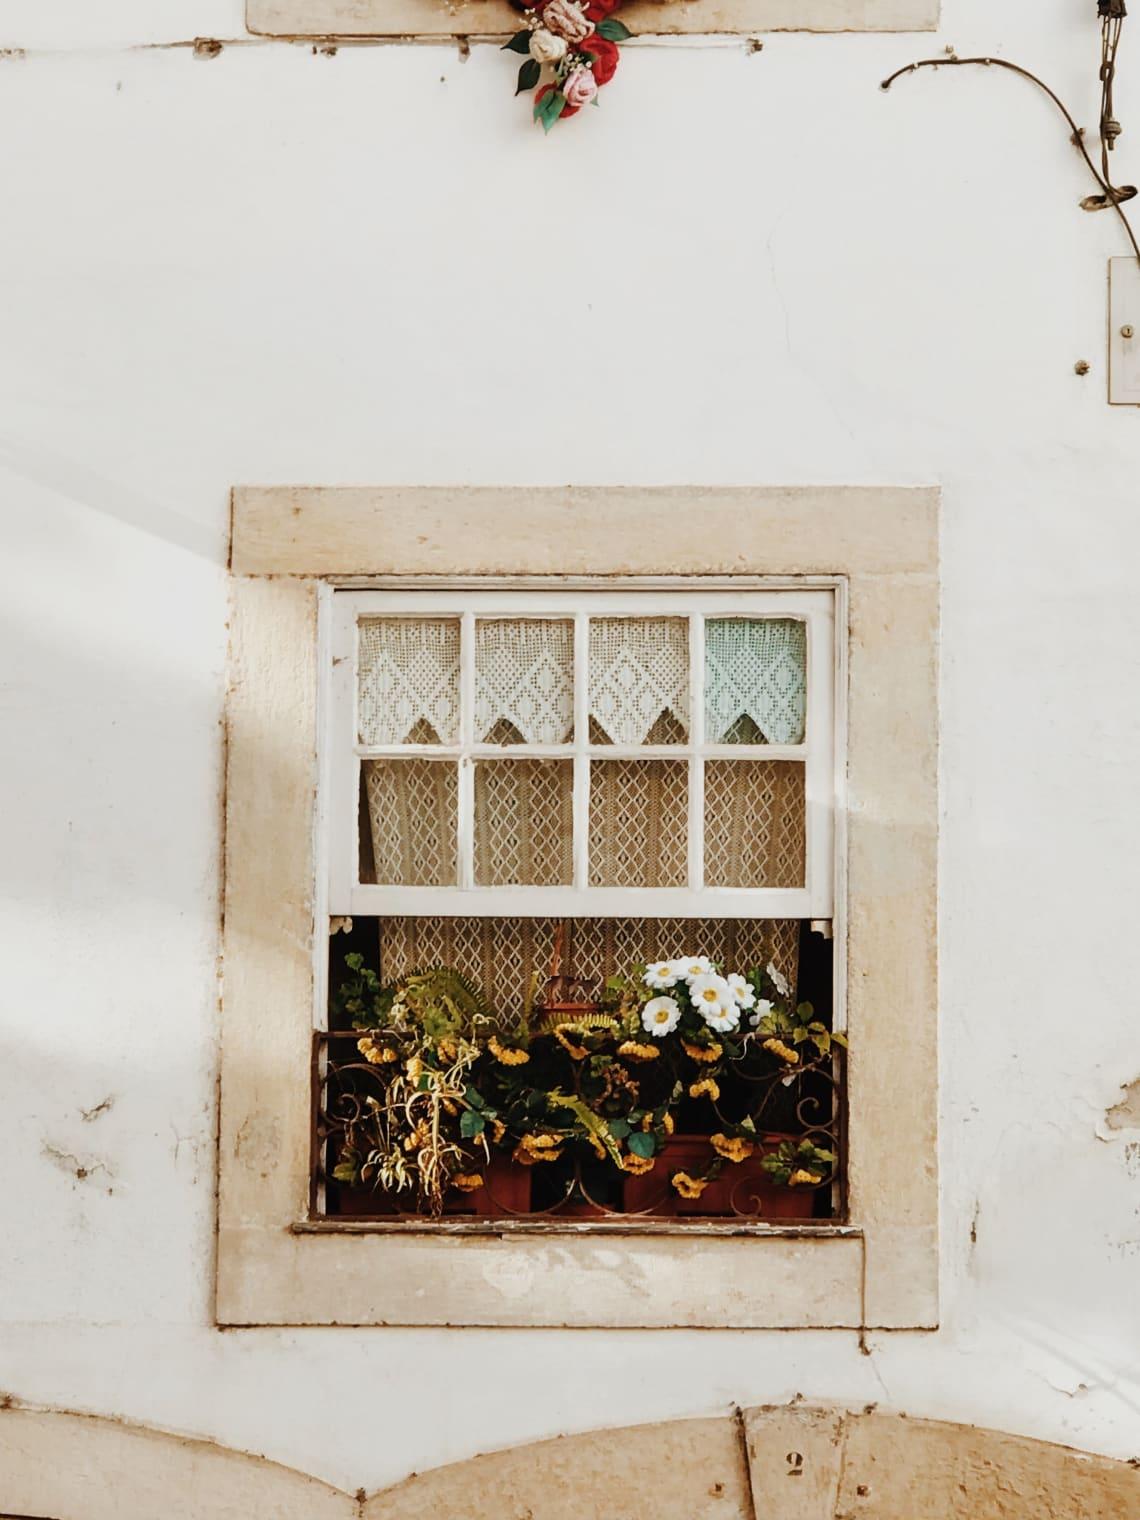 Cute streets in Coimbra, Portugal